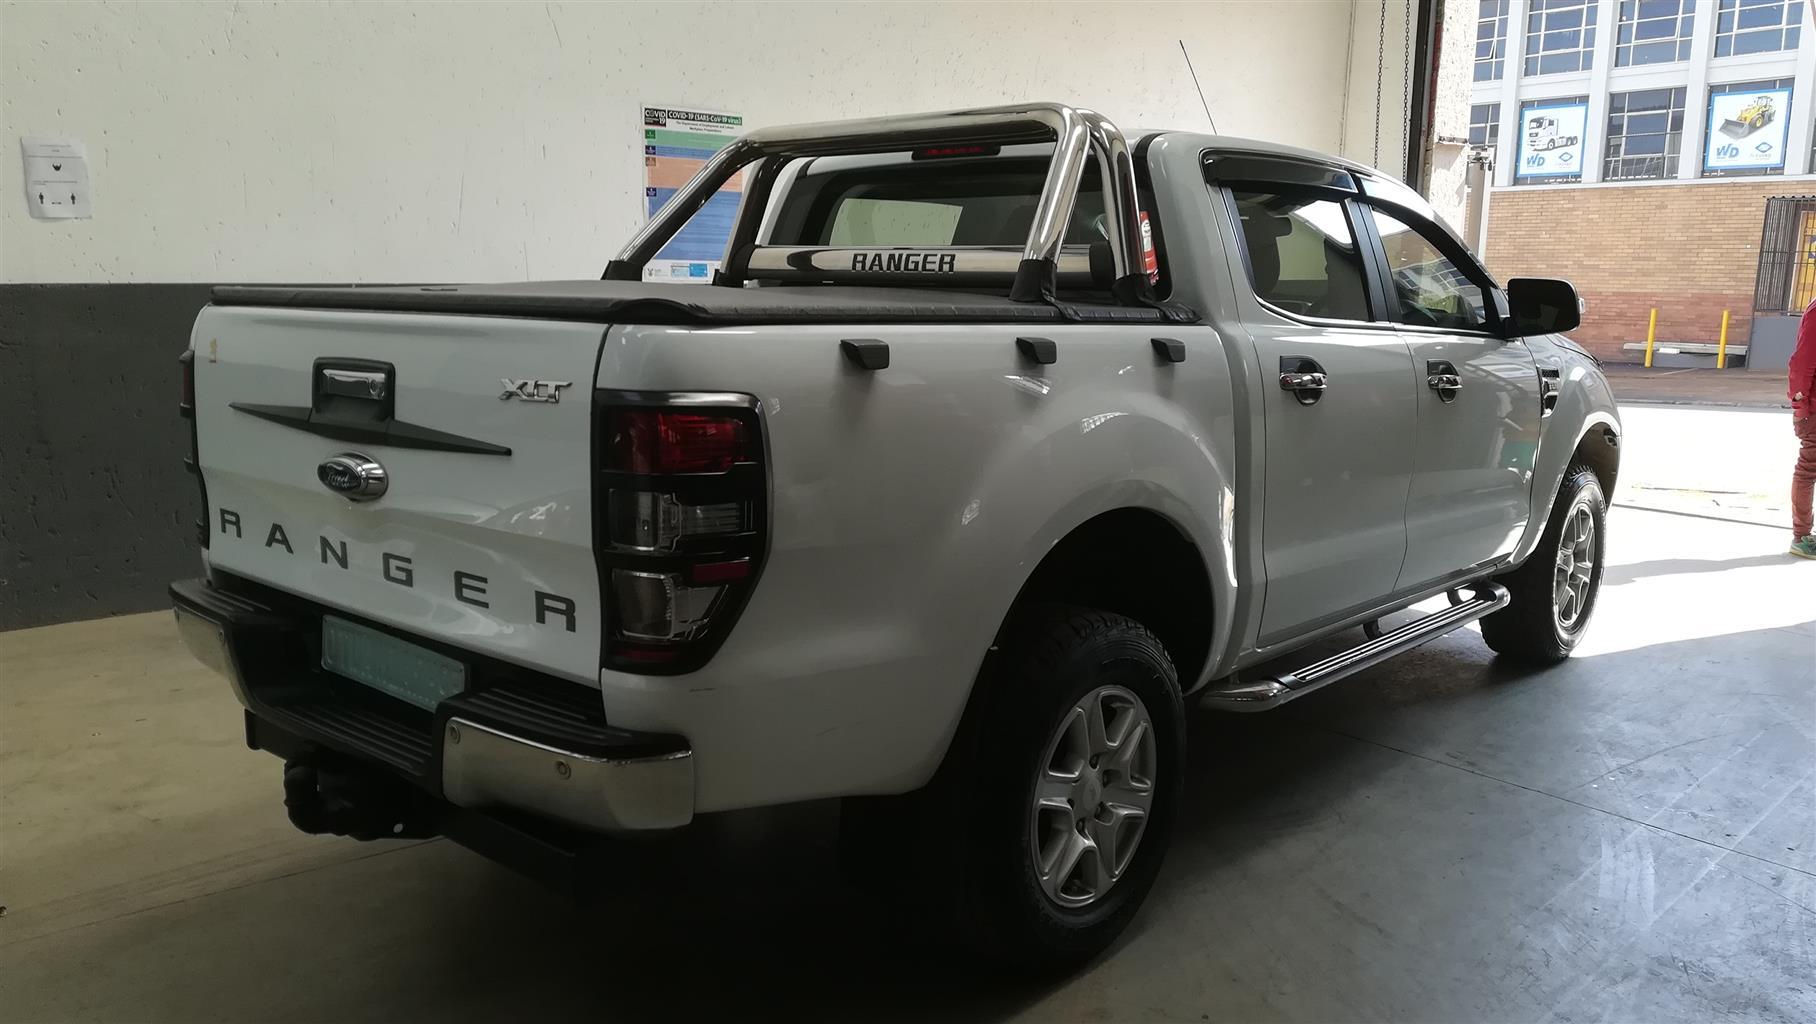 2014 Ford Ranger 3.2 double cab Hi Rider XLT